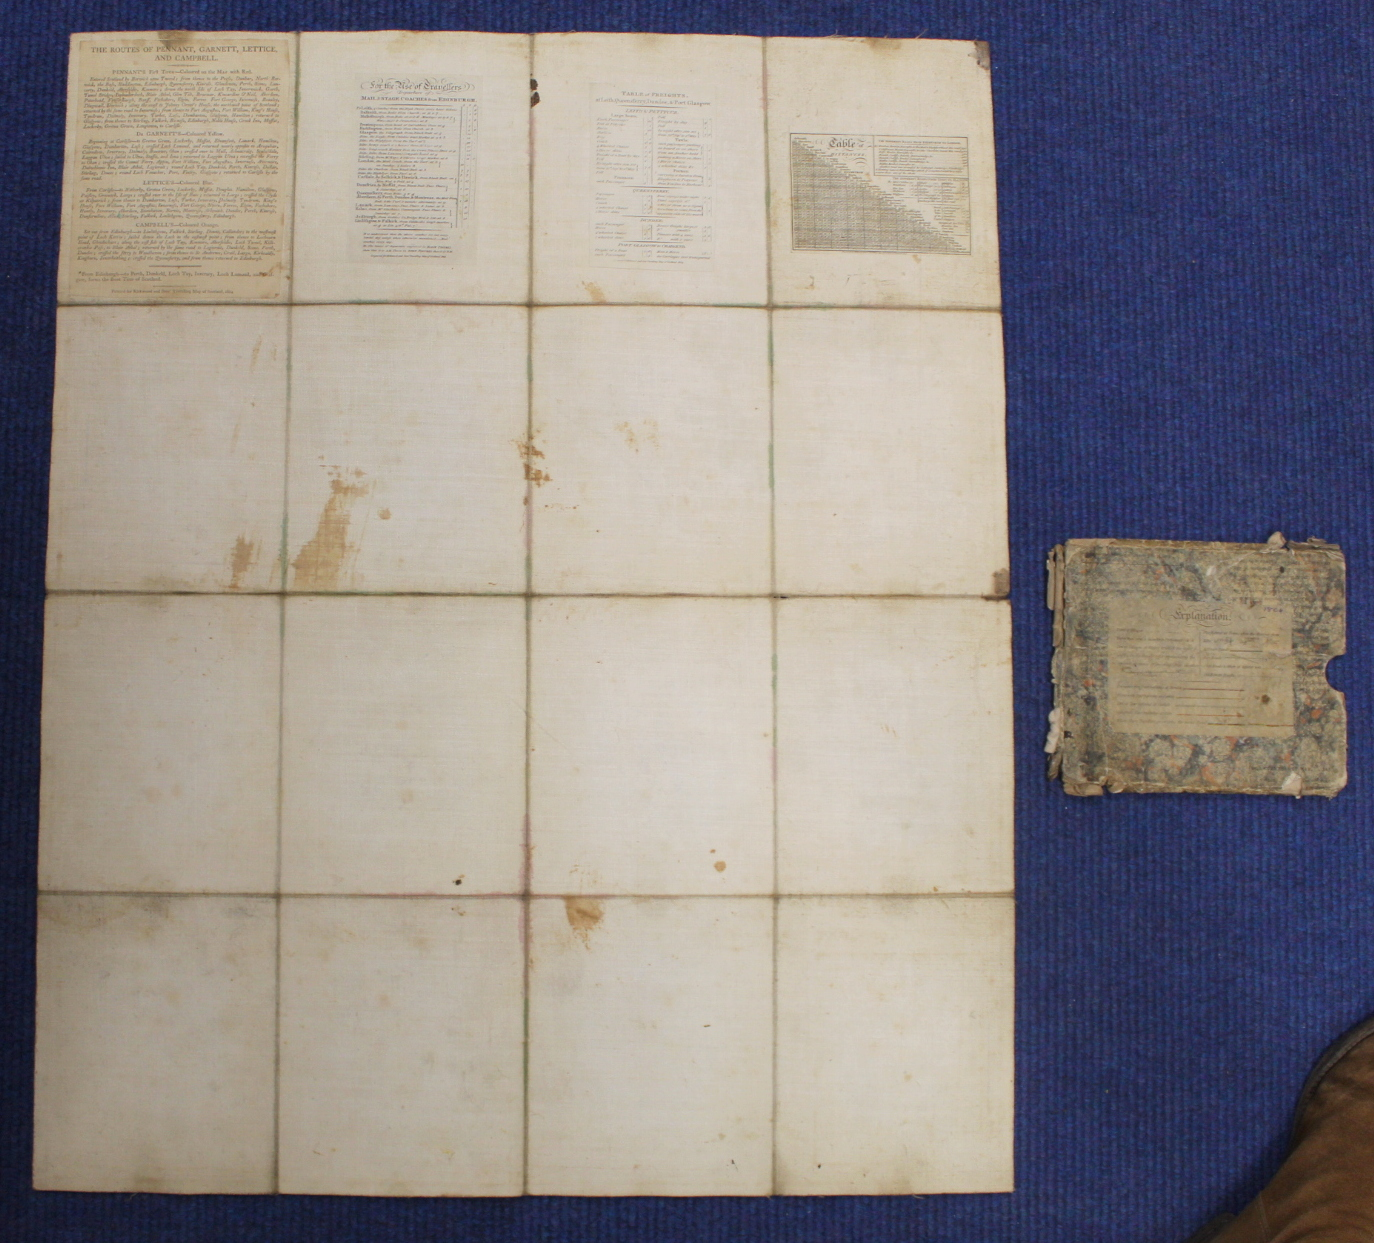 KIRKWOOD J. & SONS.Map of Scotland. Hand col. eng. fldg. linen map in well worn orig. slip case. - Image 14 of 36